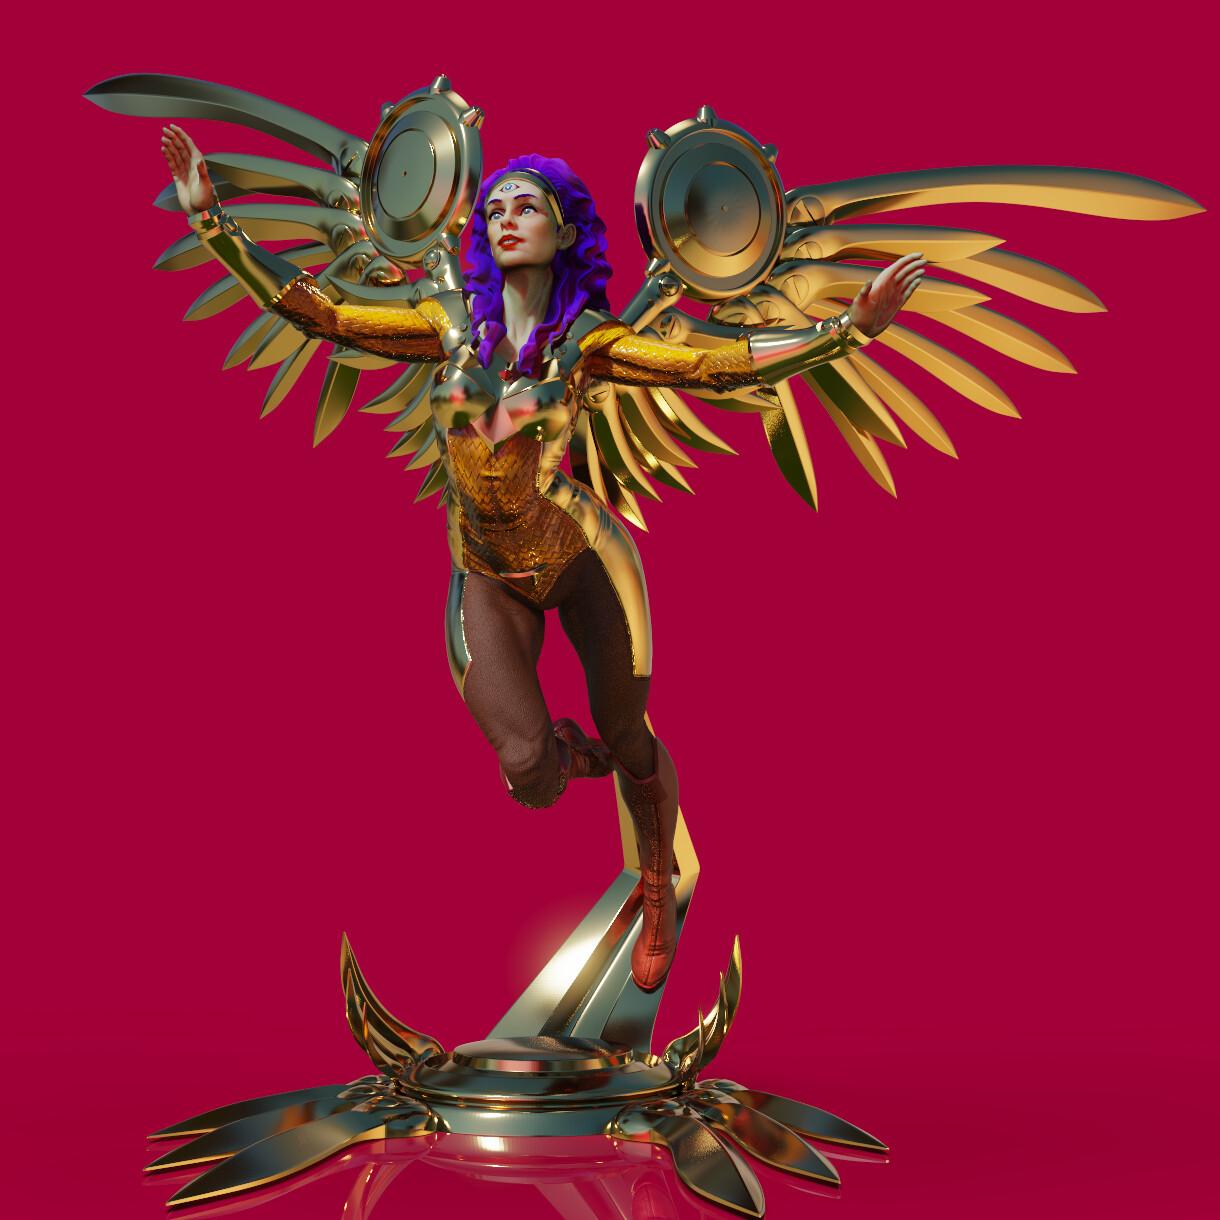 Reina Alada - Los Valientes